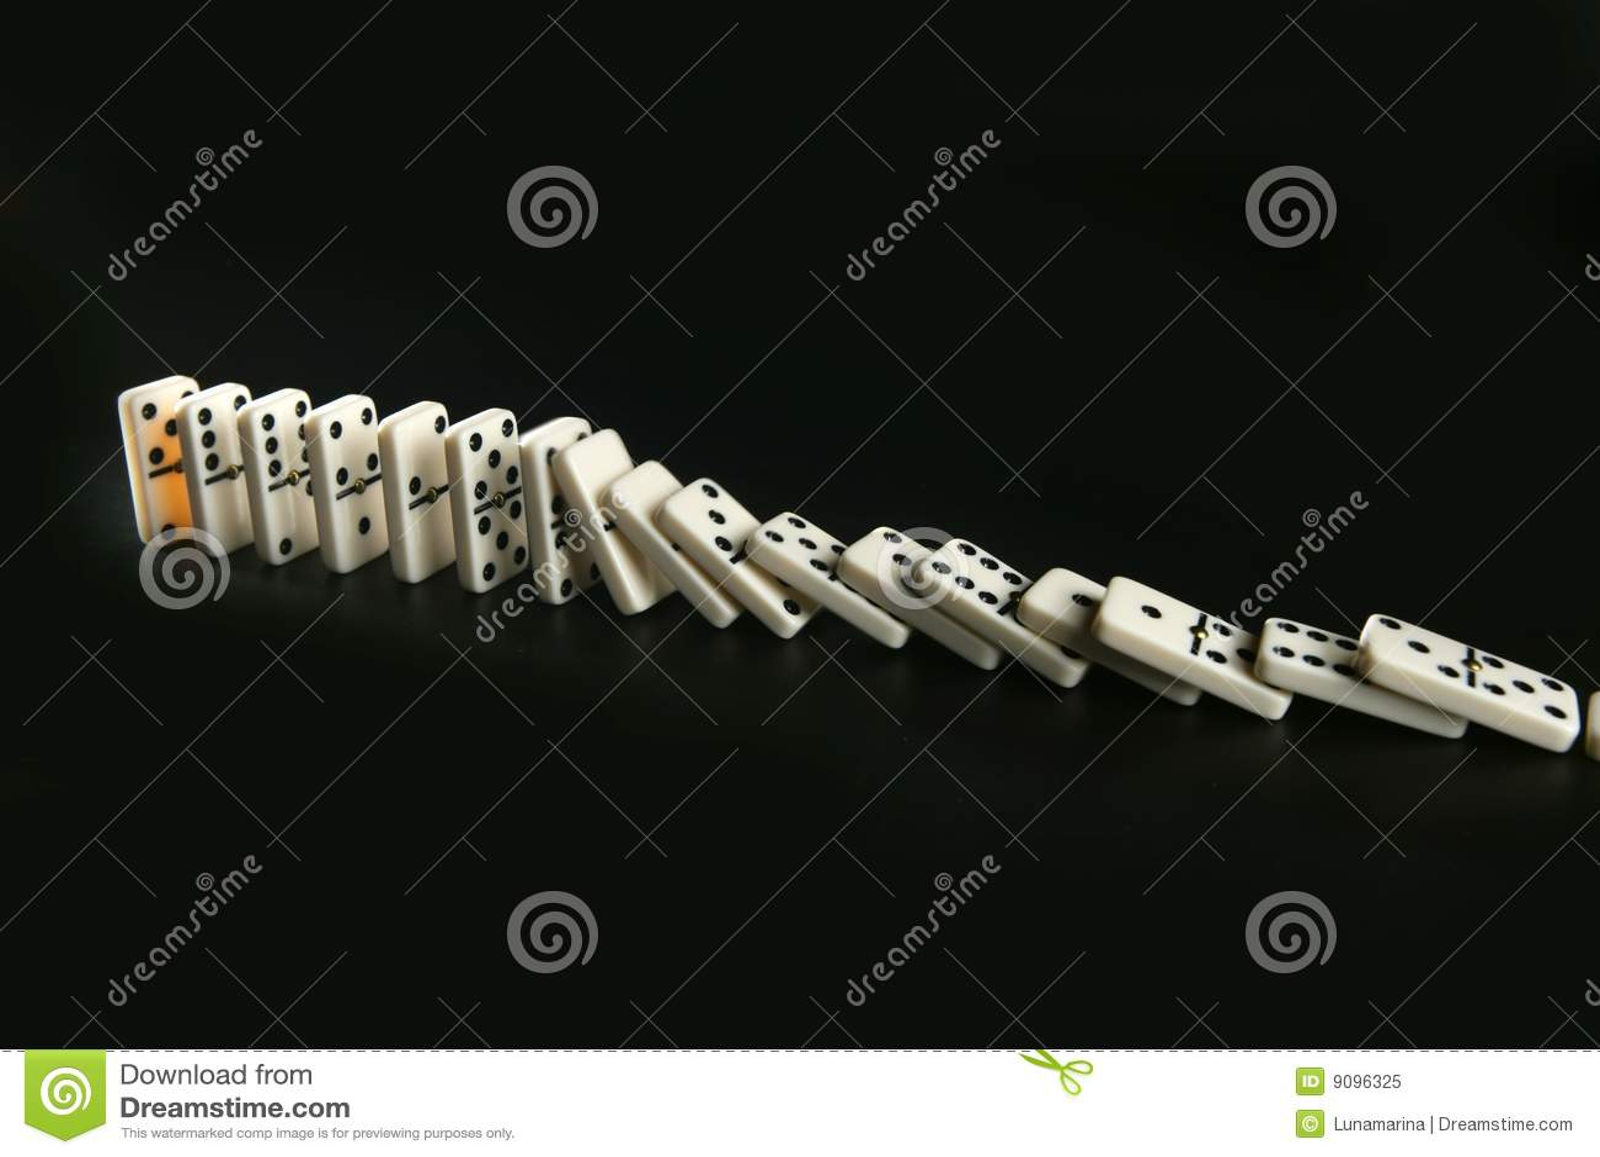 Dominospiel-Geschäftsmetapher